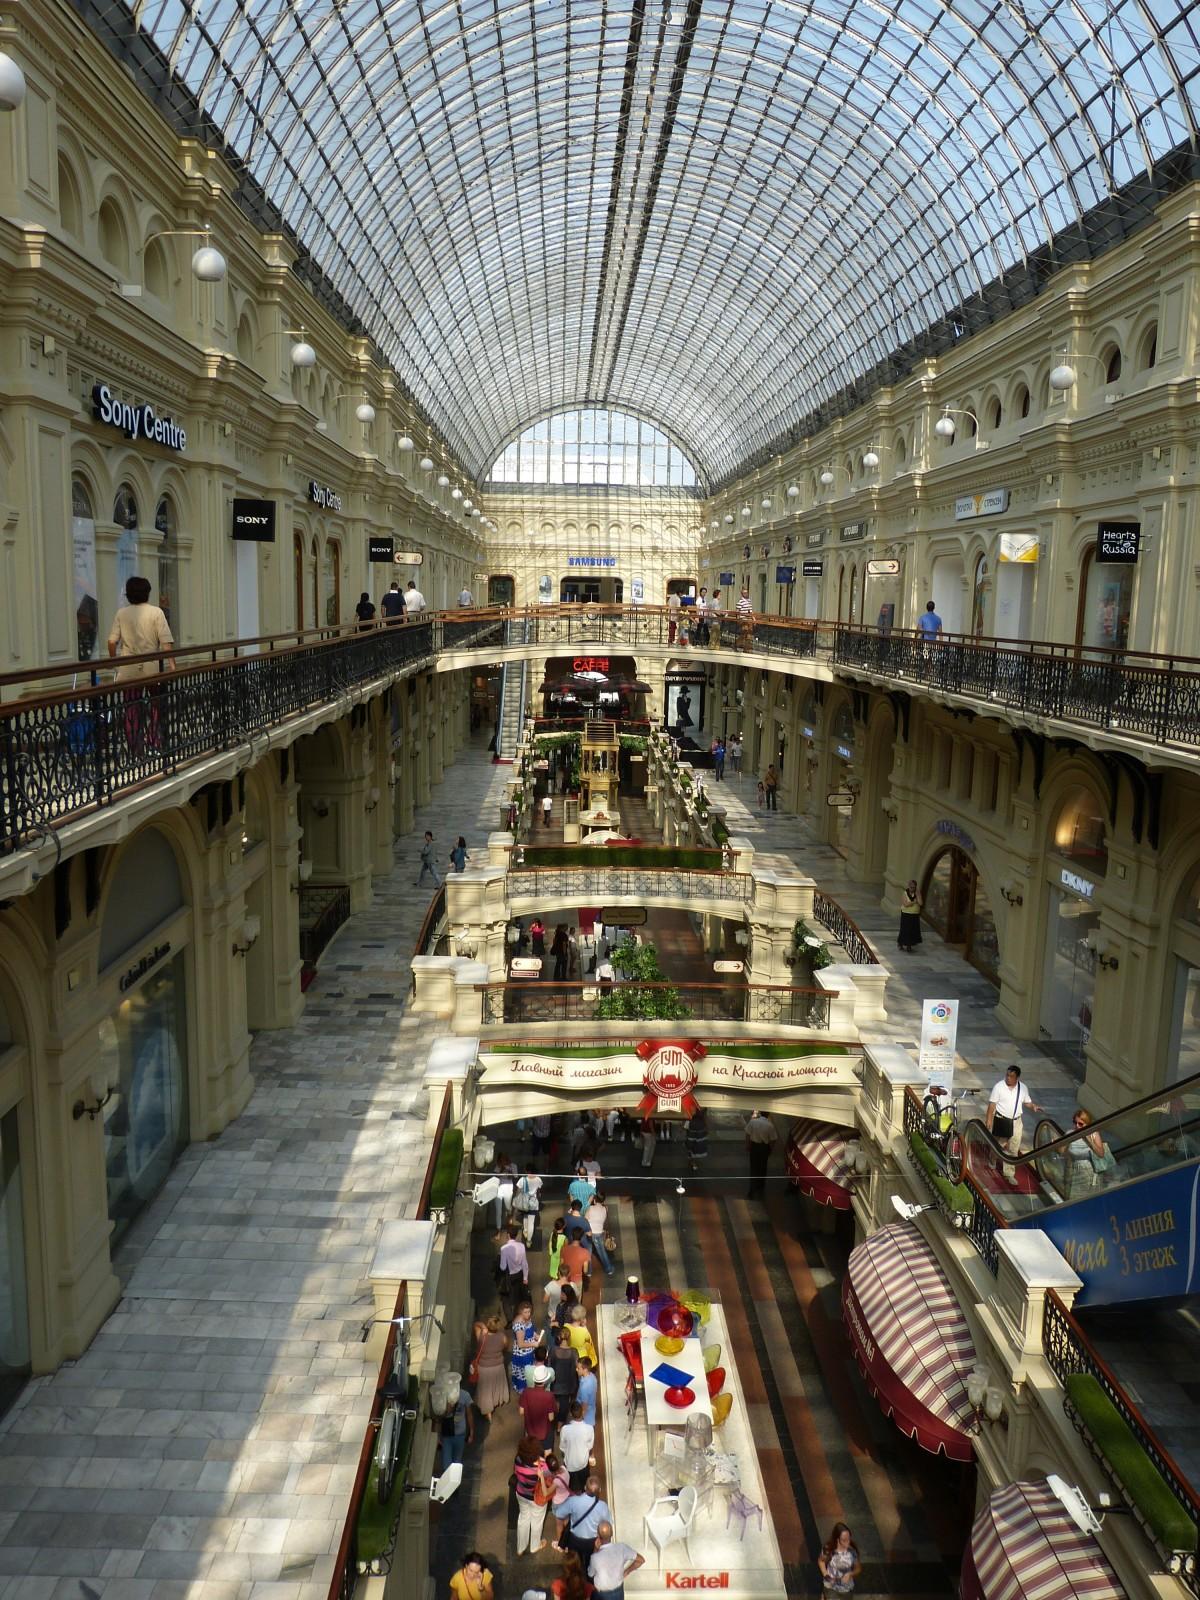 Free Images Building Bazaar Gum Moscow Arcade